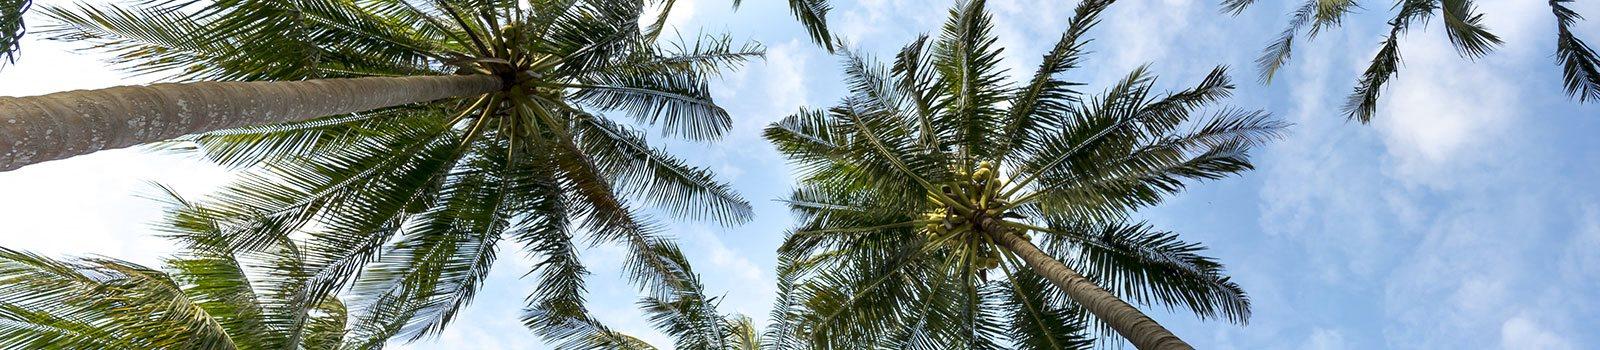 Palm trees_Valencia Park Orlando, FL